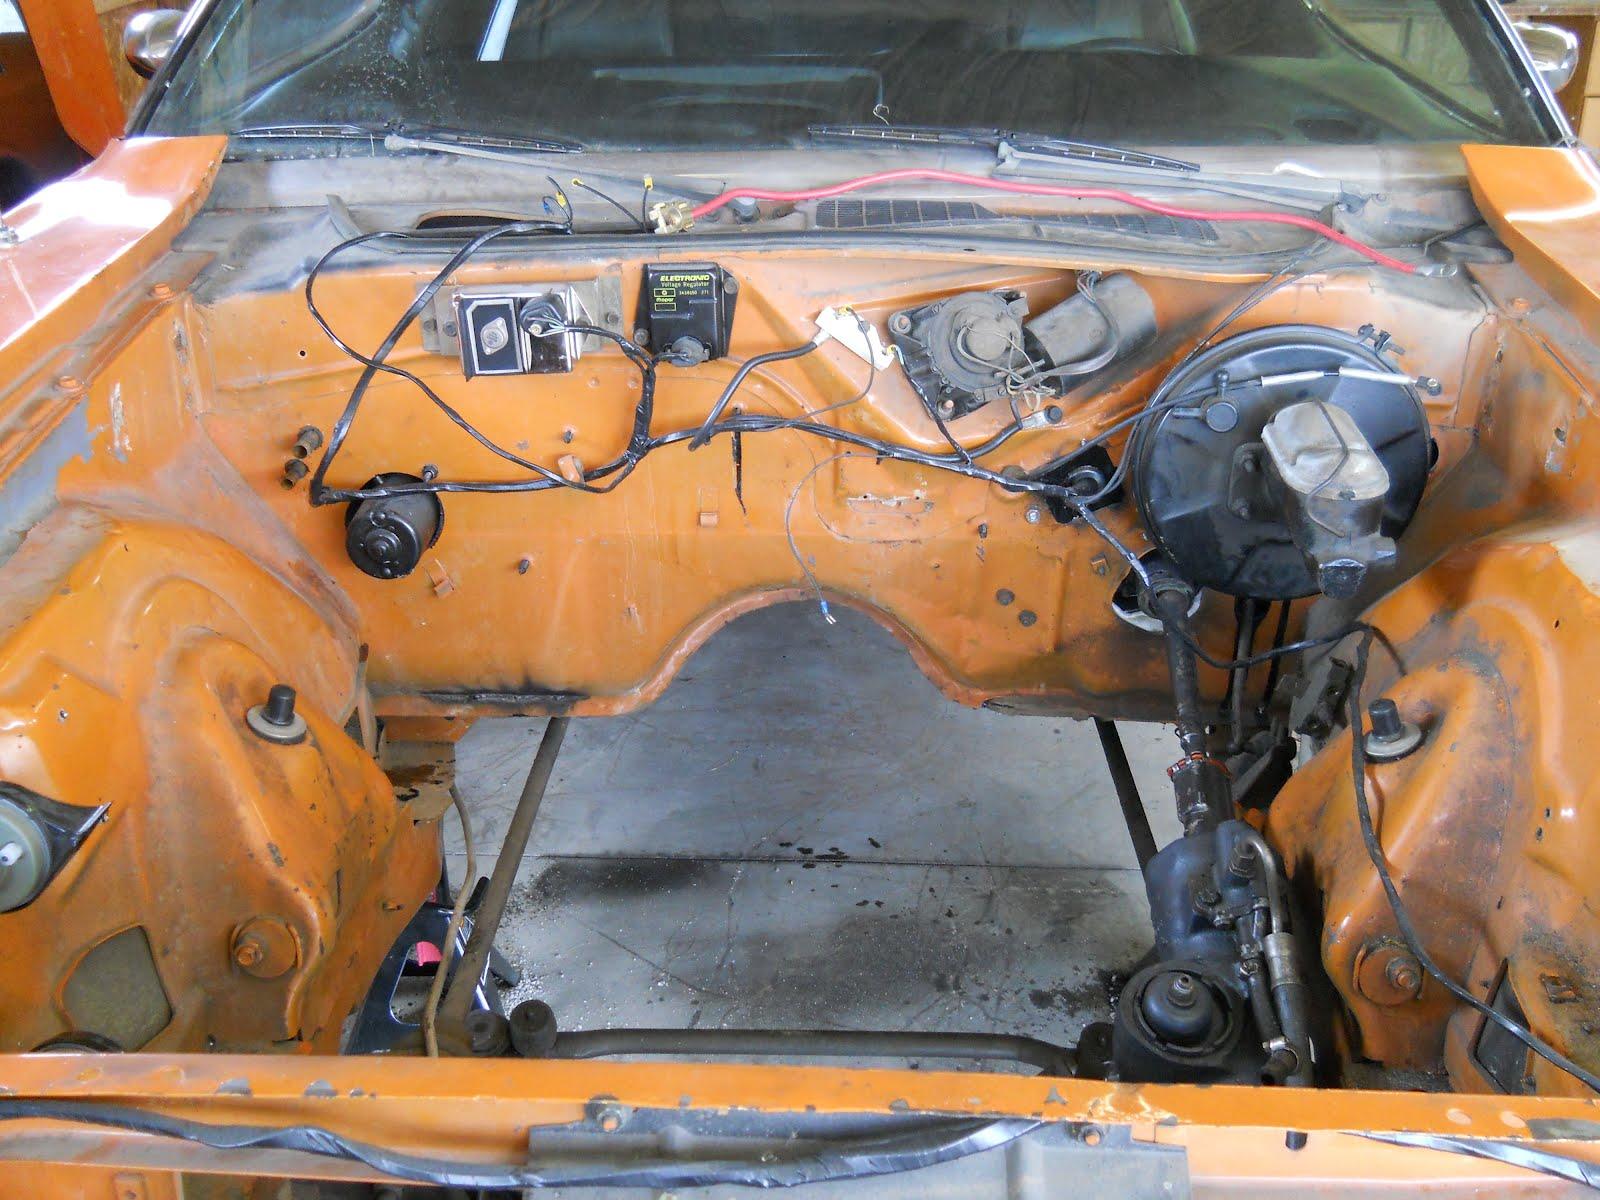 1972 Dodge Dart Wiring Diagram 120v Transformer Motor City Muscle: Work On Dad's 1970 Challenger R/t